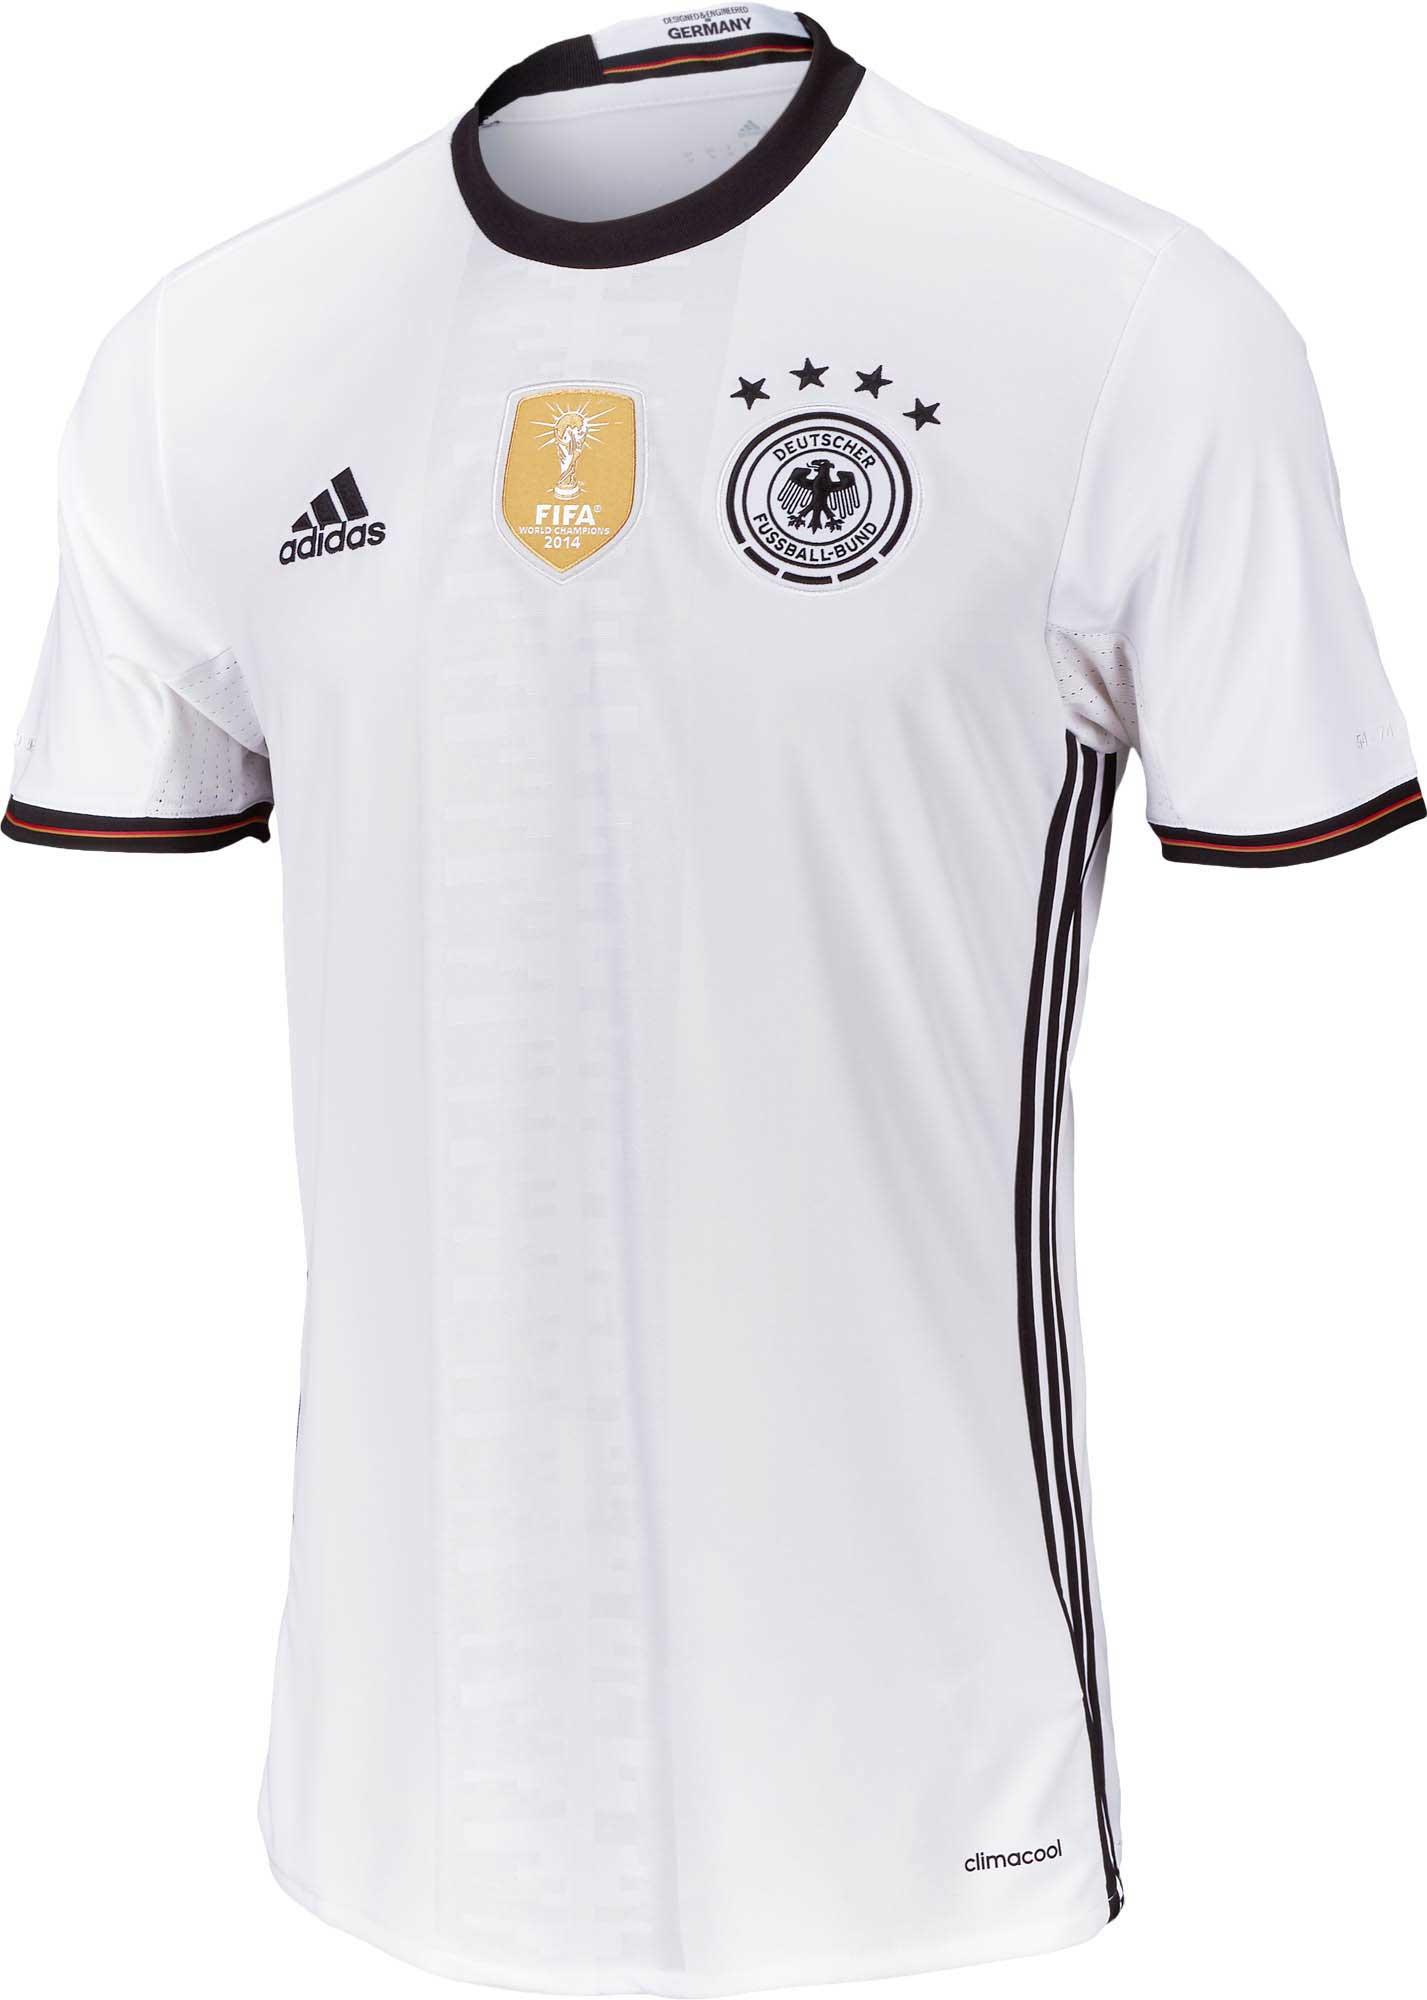 2016/17 Kids adidas Germany Home Jersey